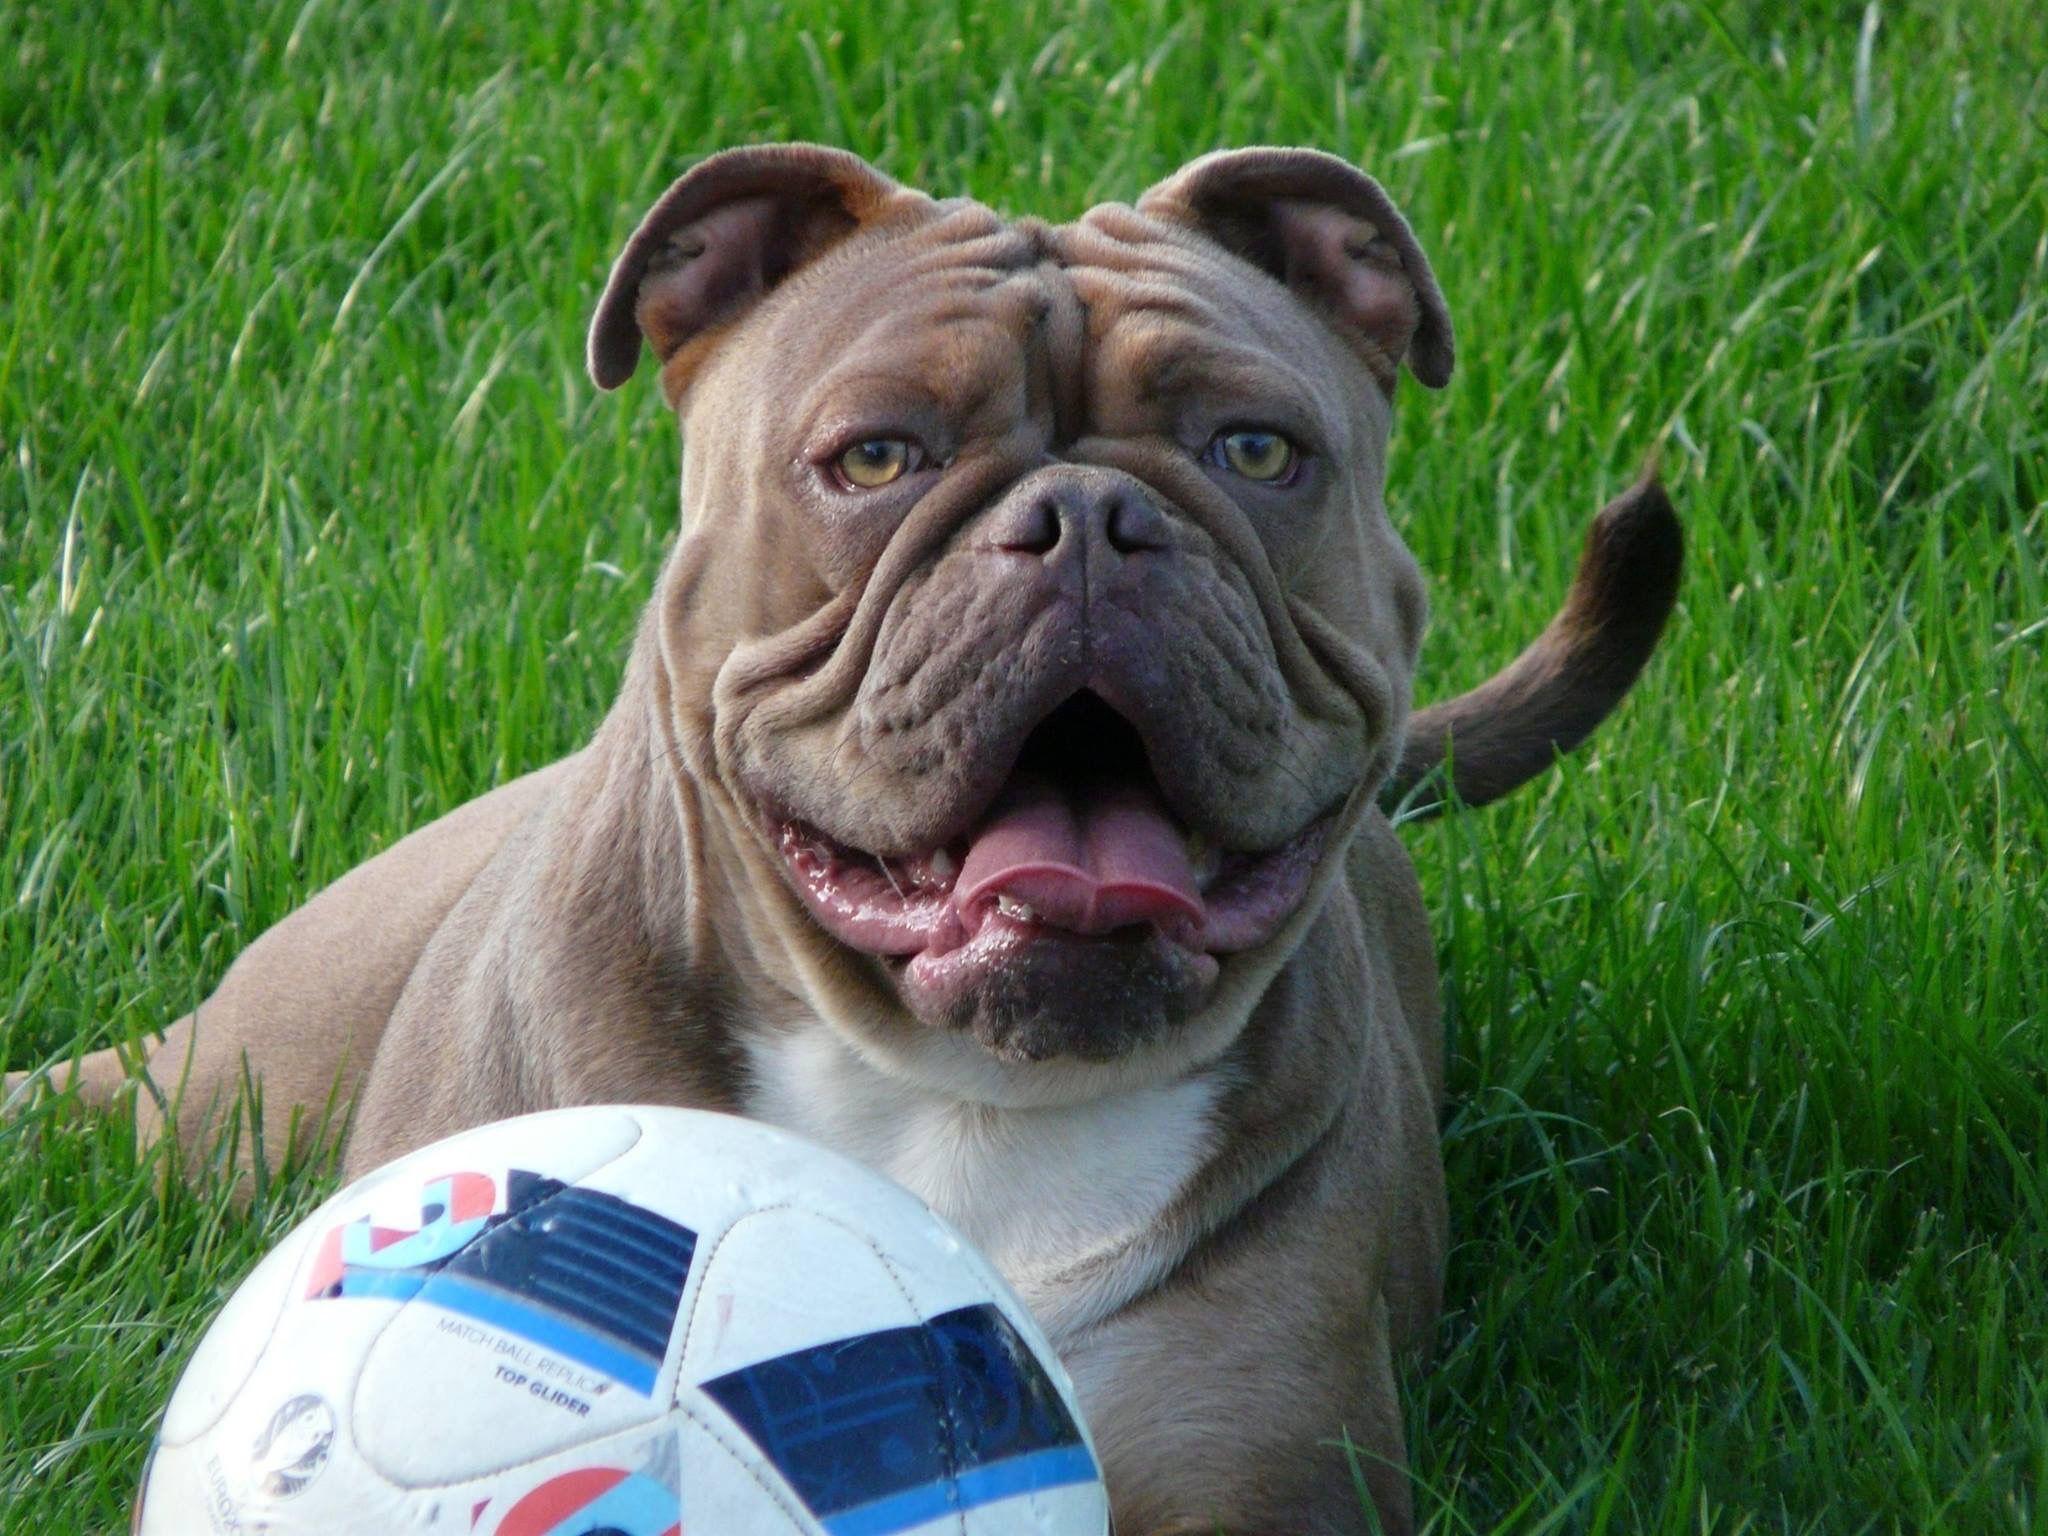 Pin Von Awa Origins Auf Awa Origins Old English Bulldog Englische Bulldogge Bulldogge